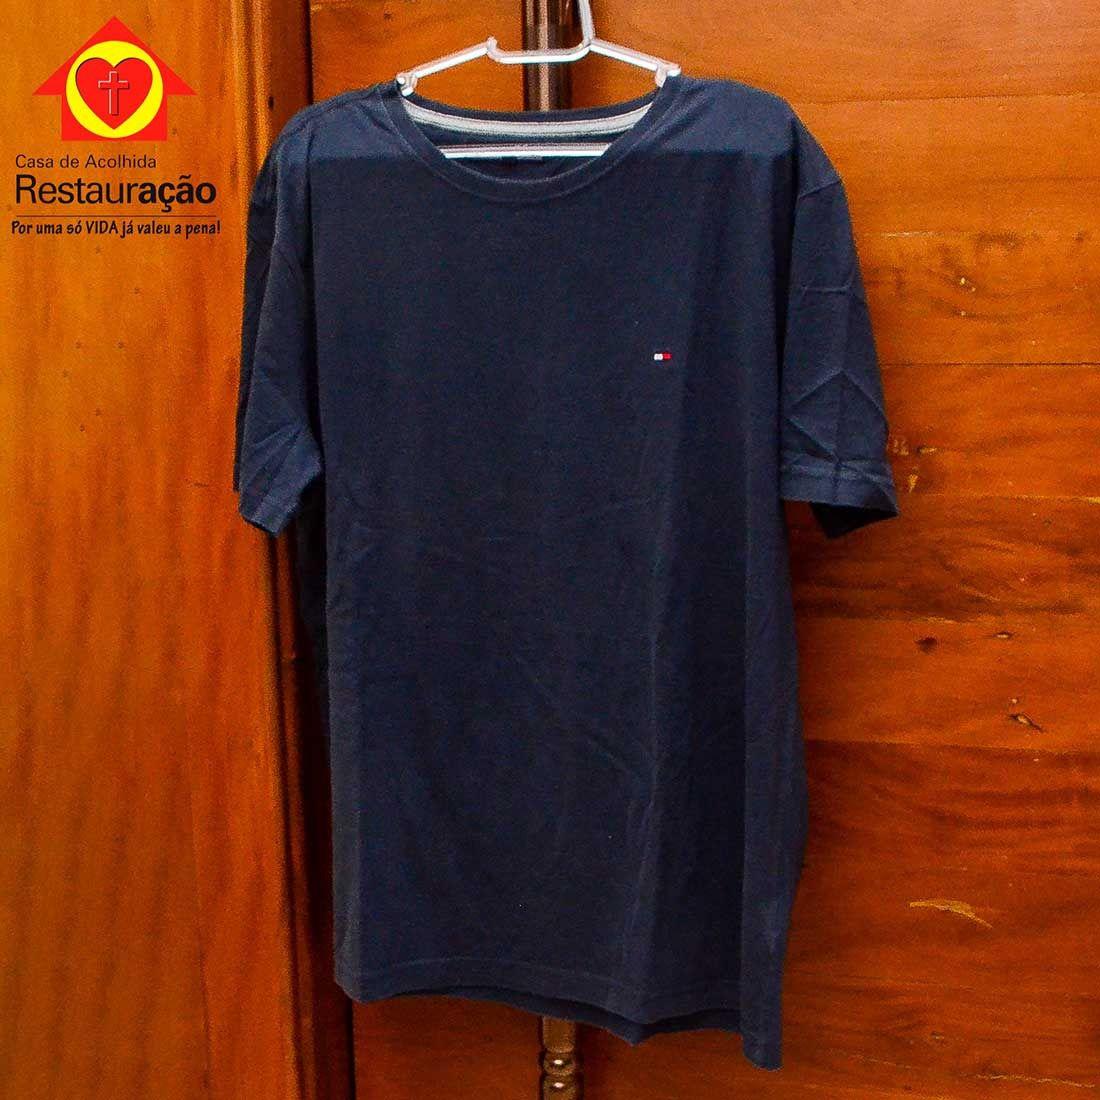 Camiseta Azul Marinho Masculina